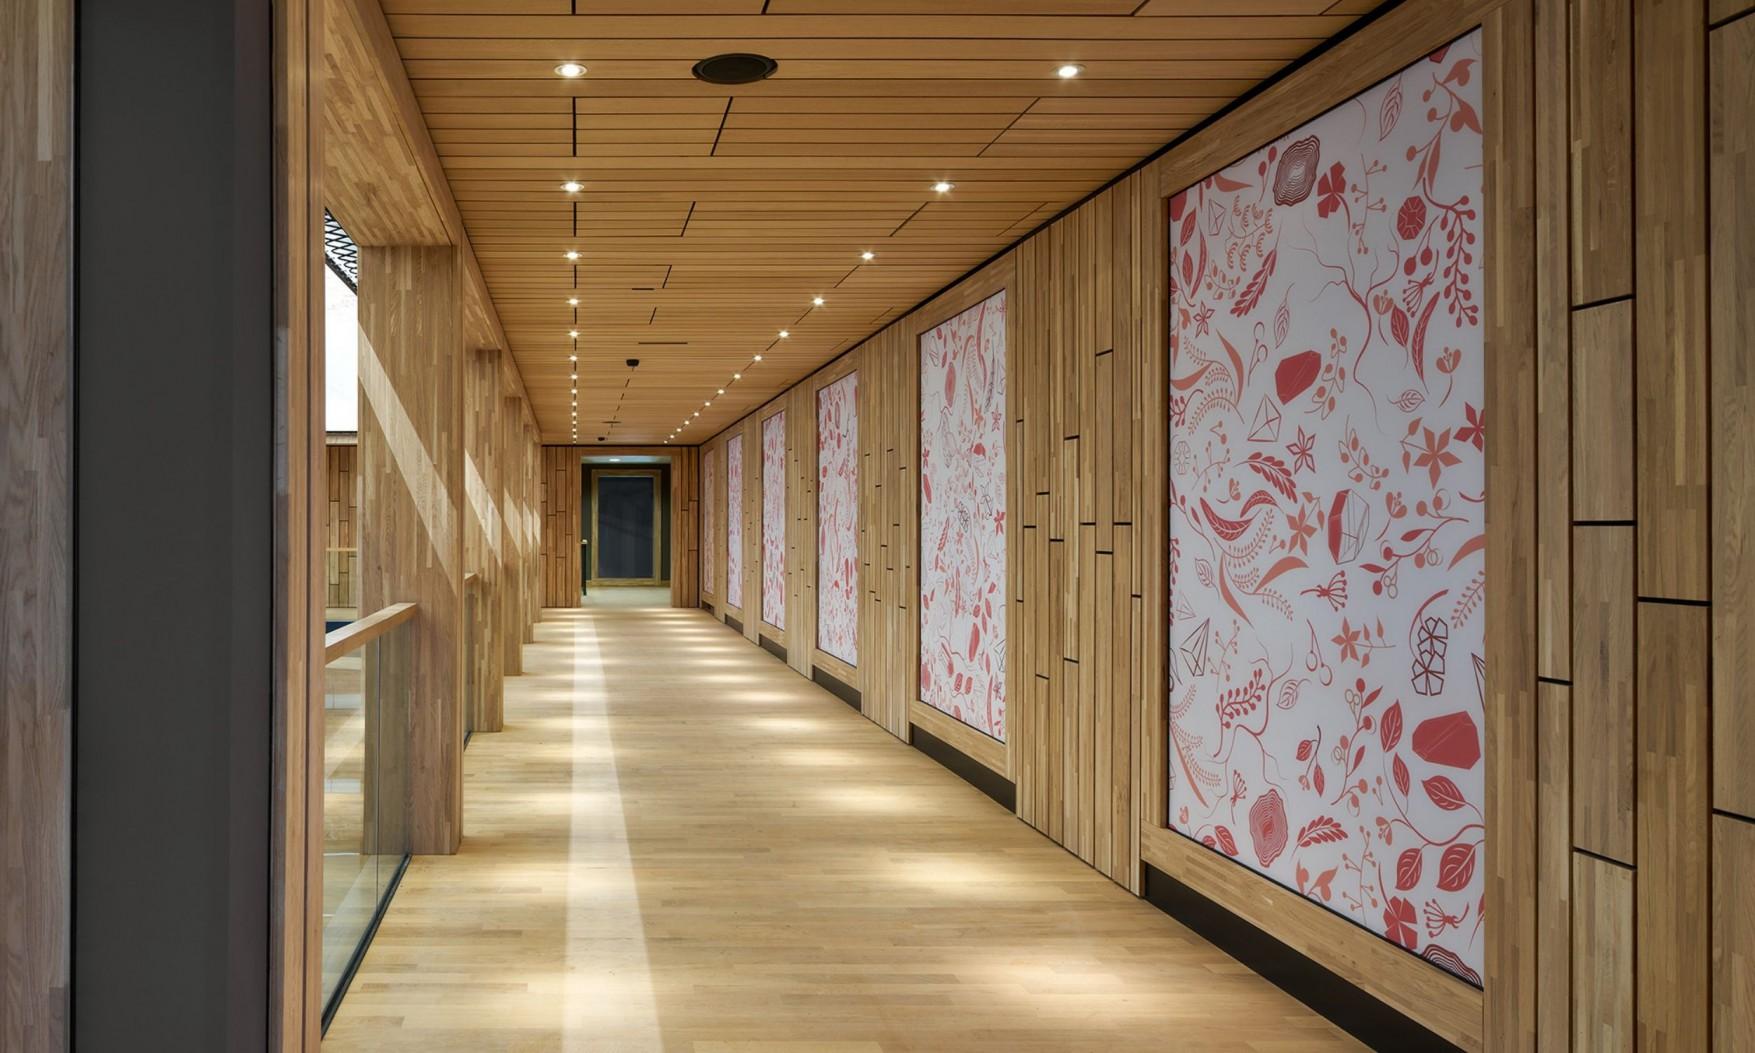 Harryvan Interieurbouw | specials plafond en wandbekleding (Naturalis Leiden)